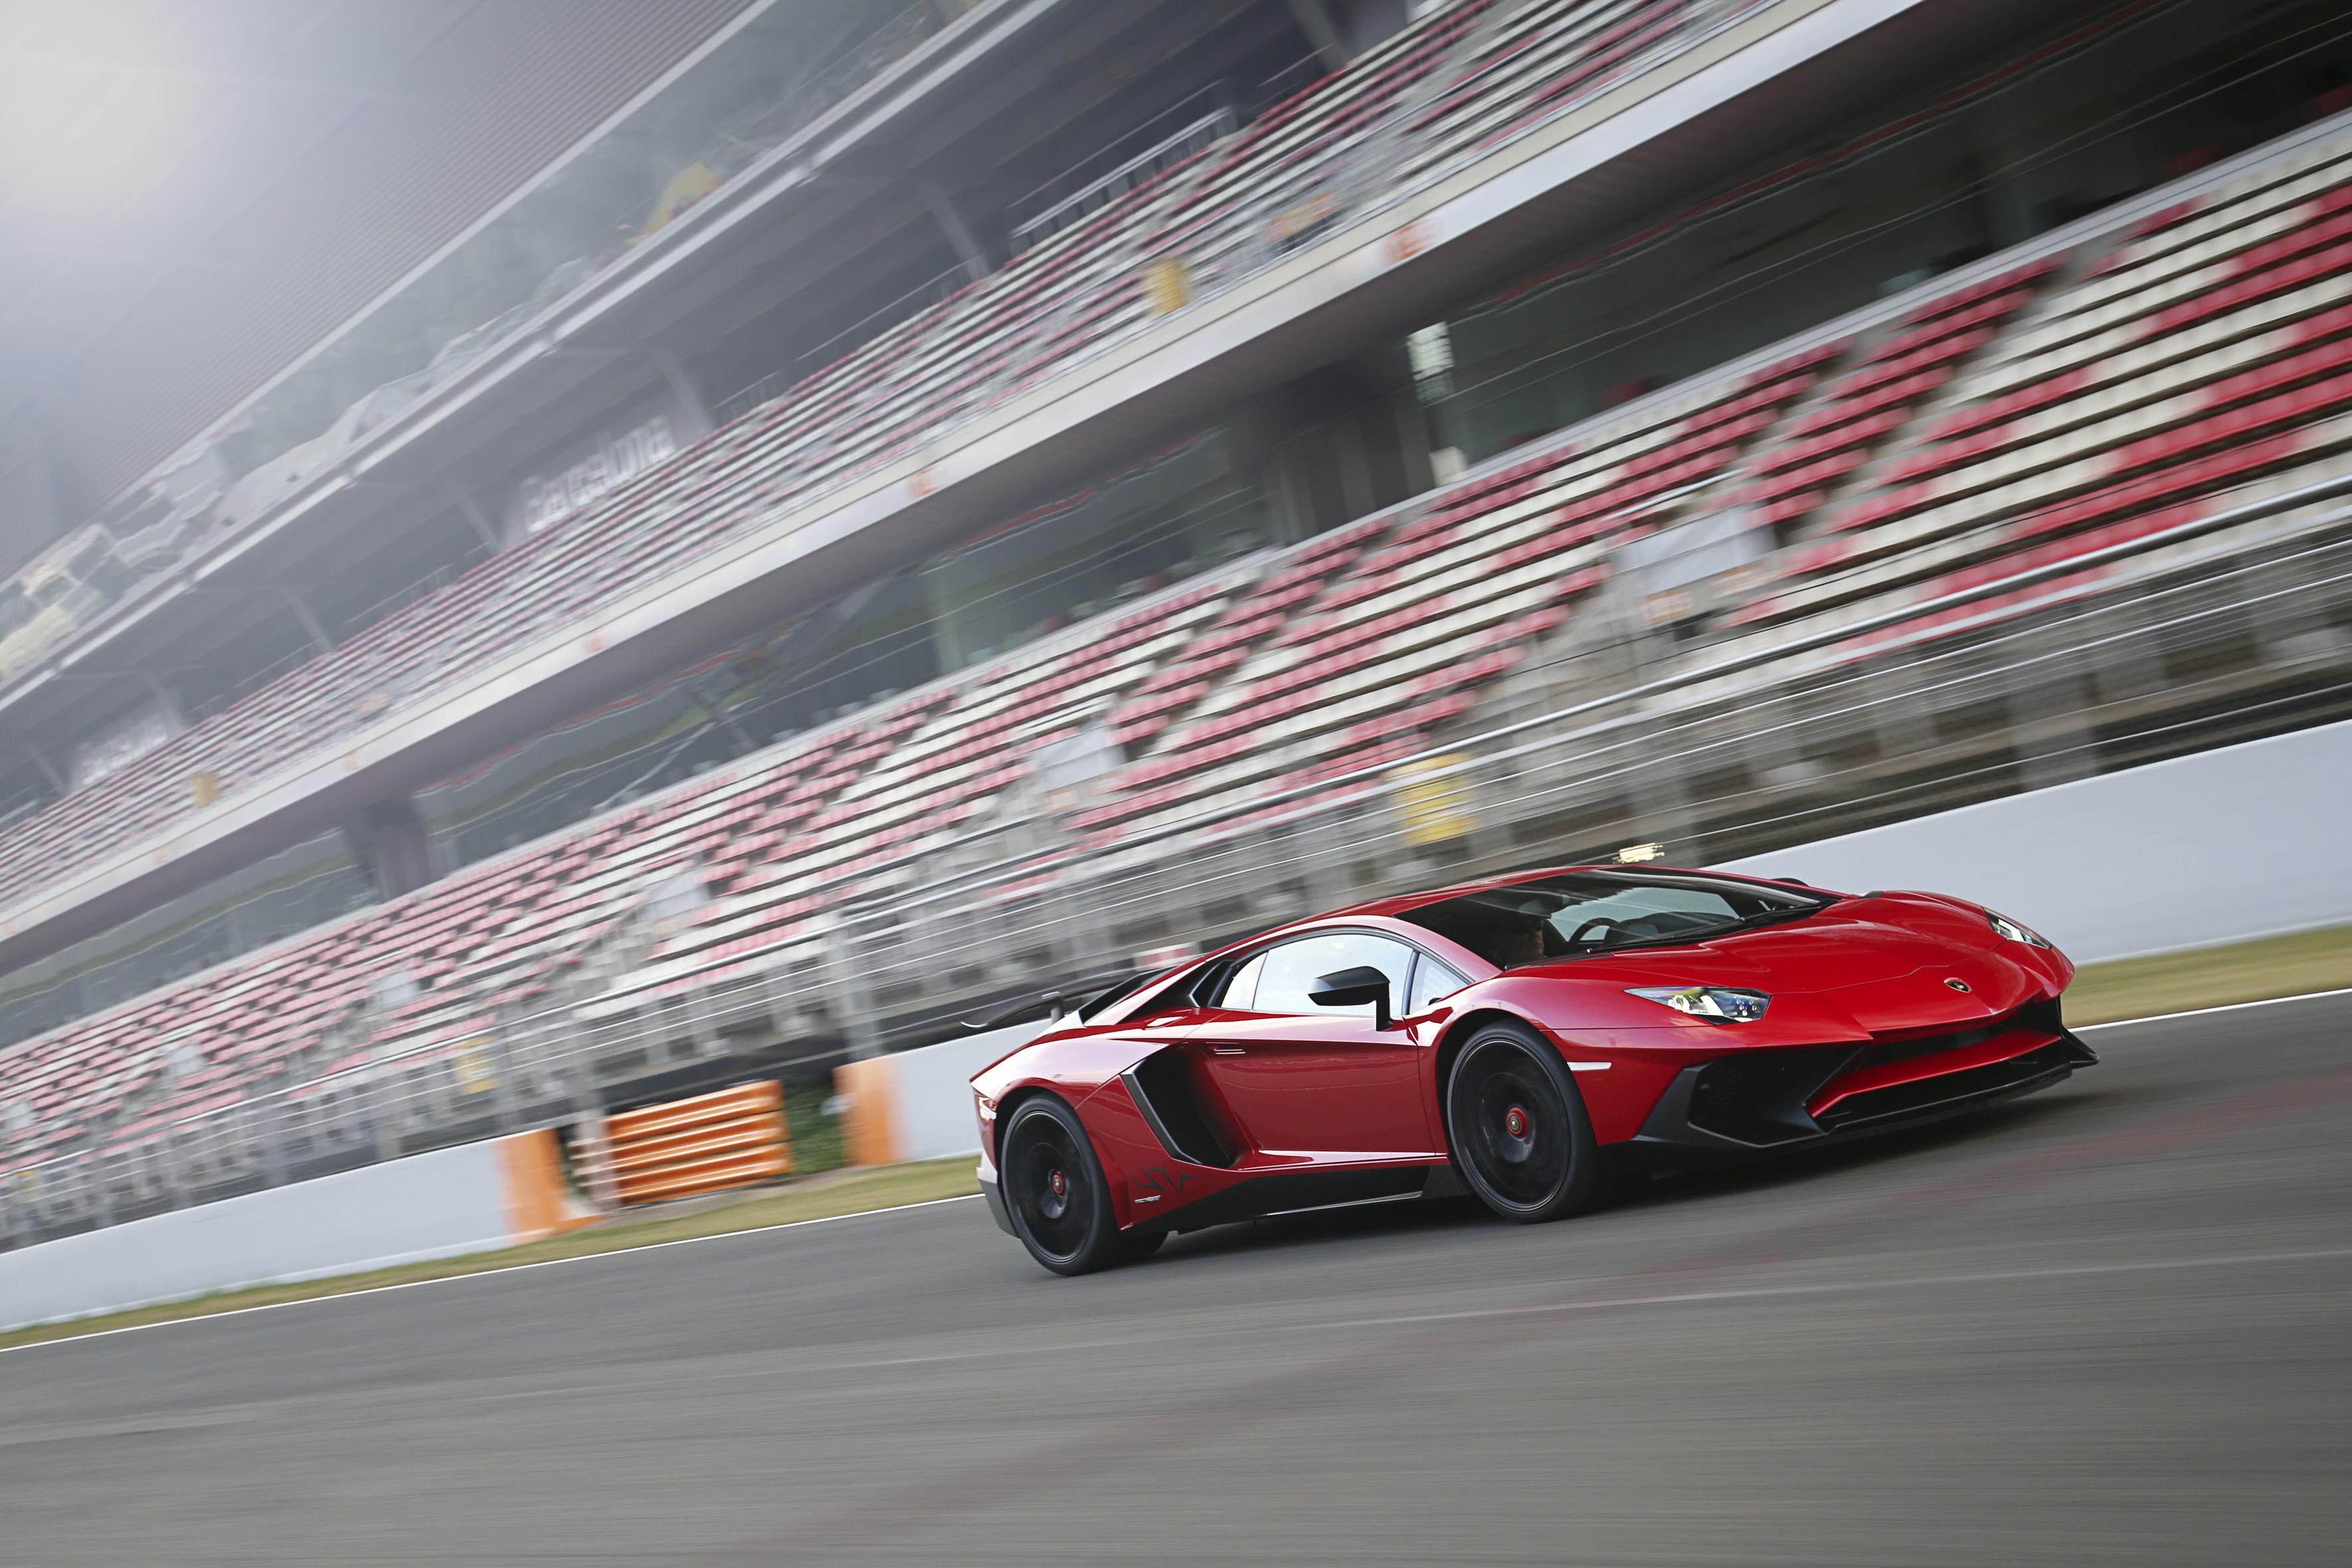 97999 download wallpaper Lamborghini, Cars, Aventador, Lp 750-4 screensavers and pictures for free